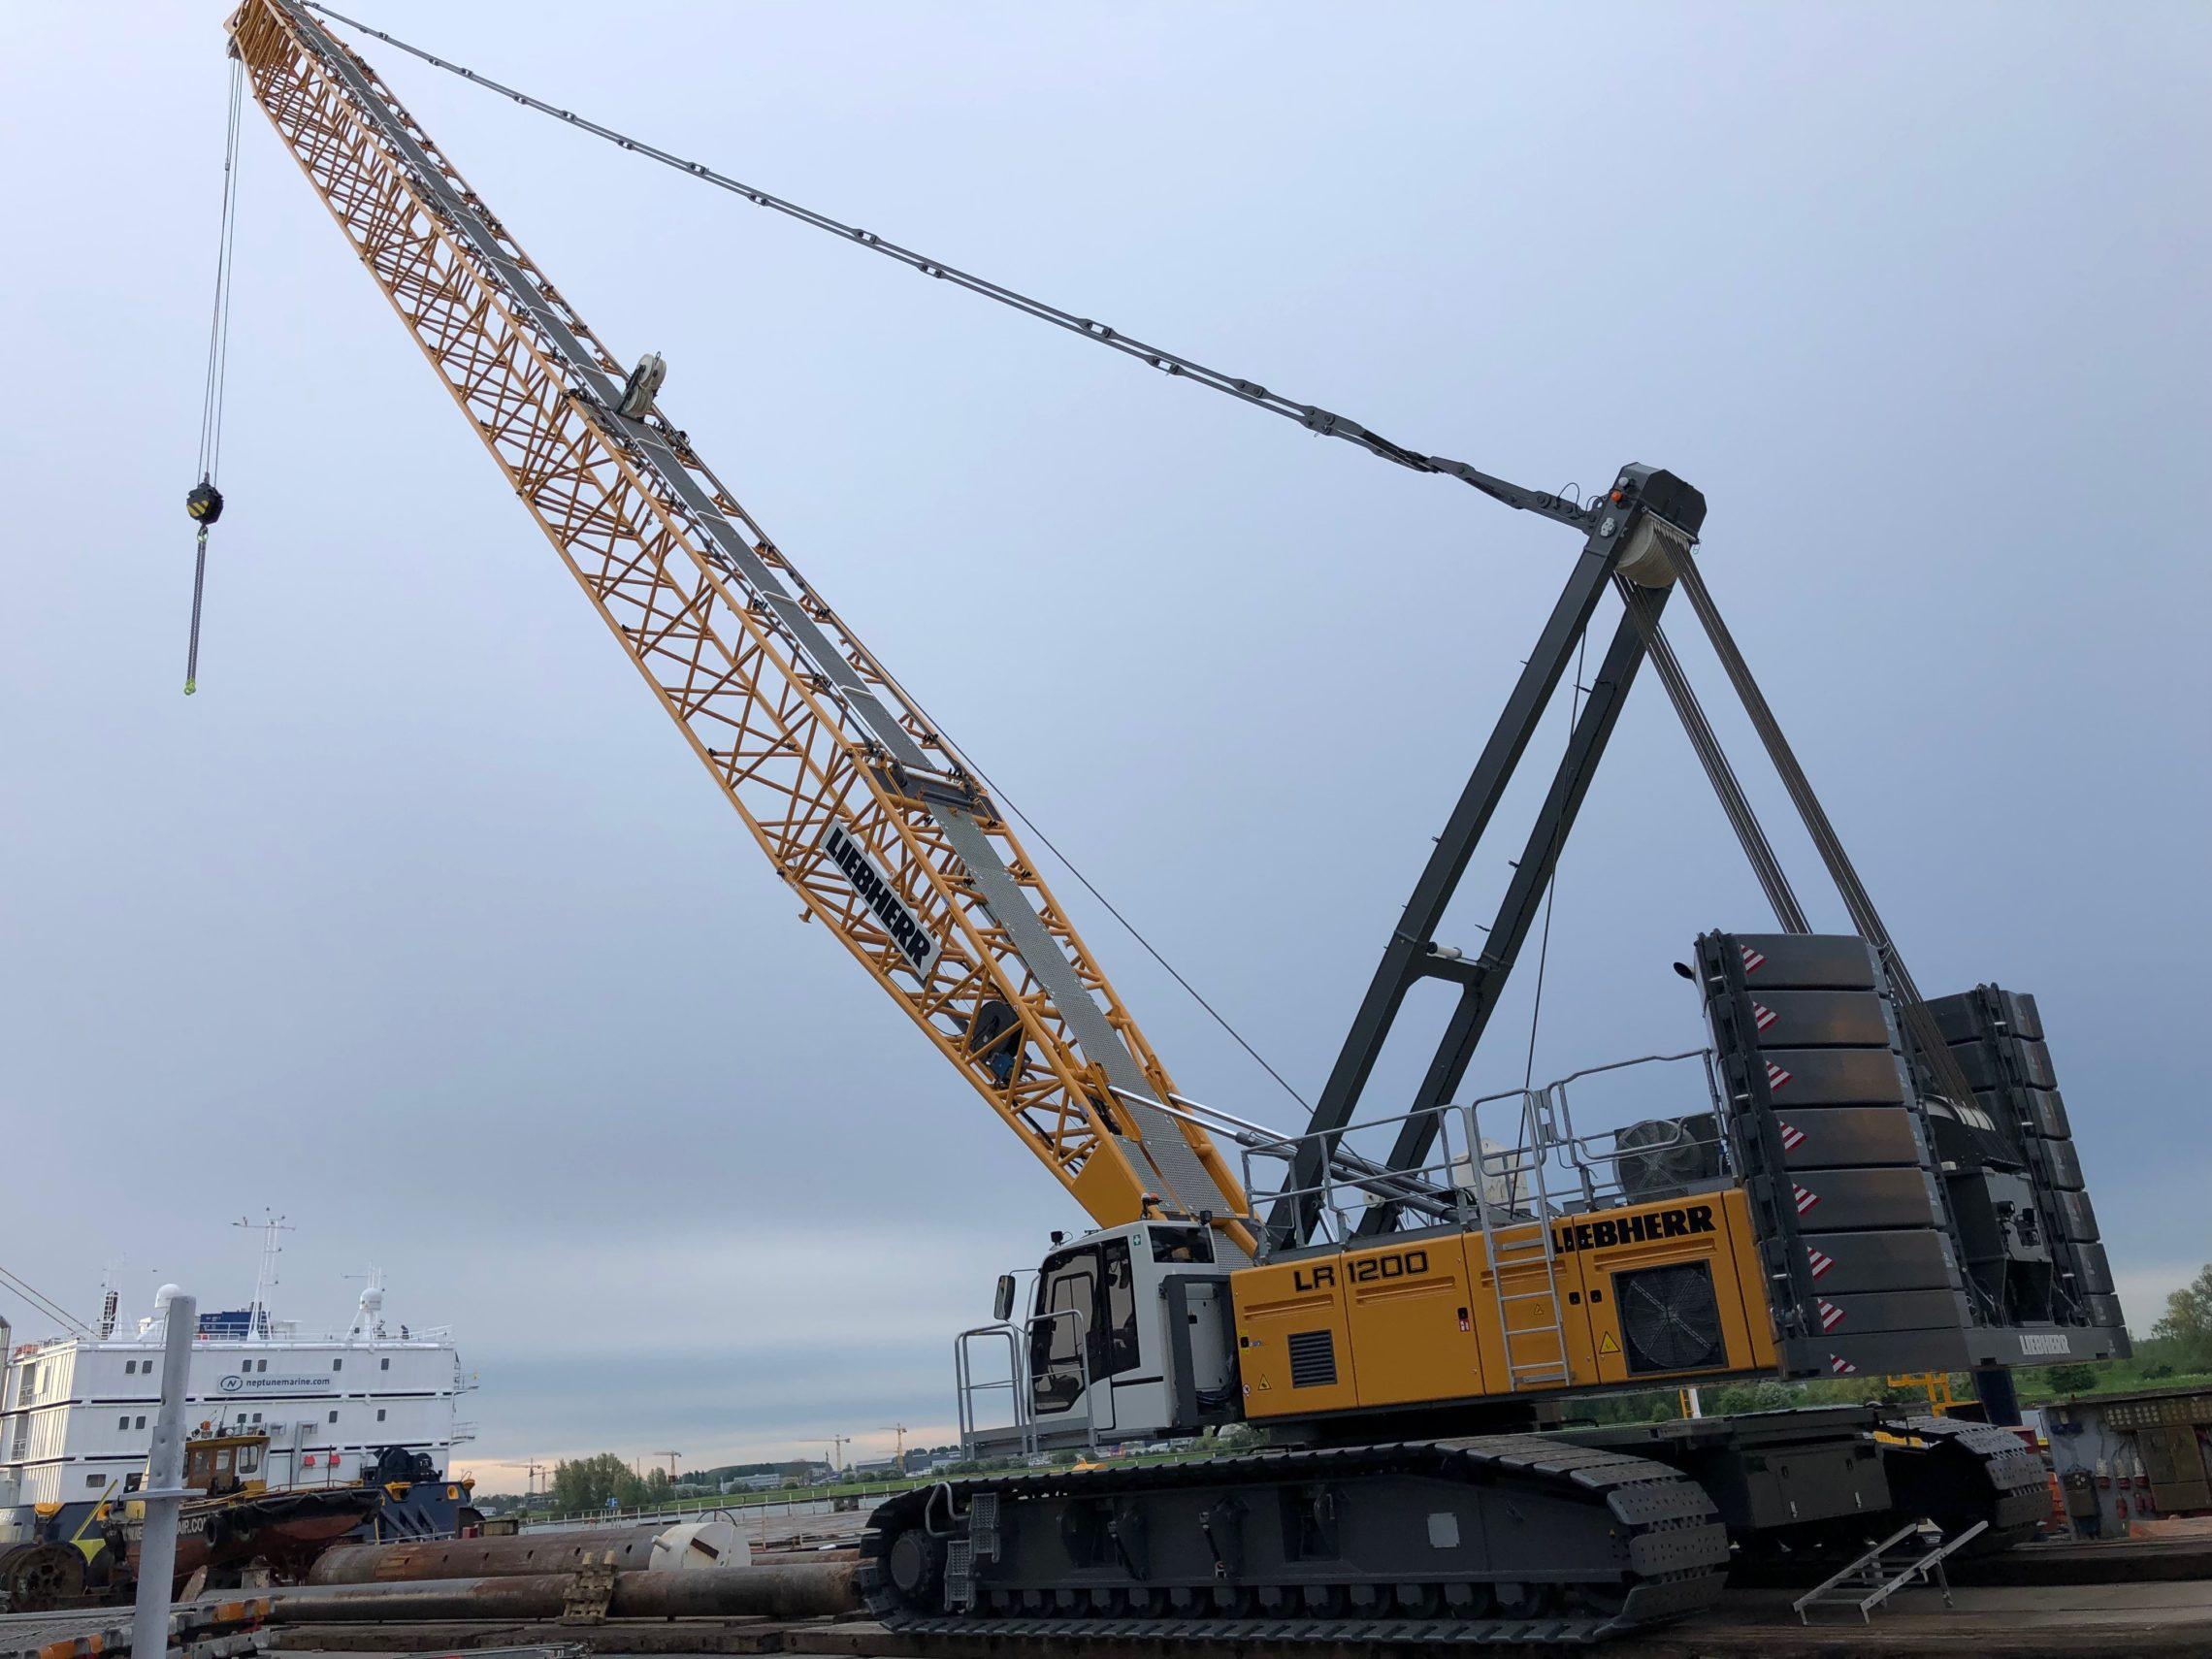 Liebherr LR 1200 crawler crane - Landfall